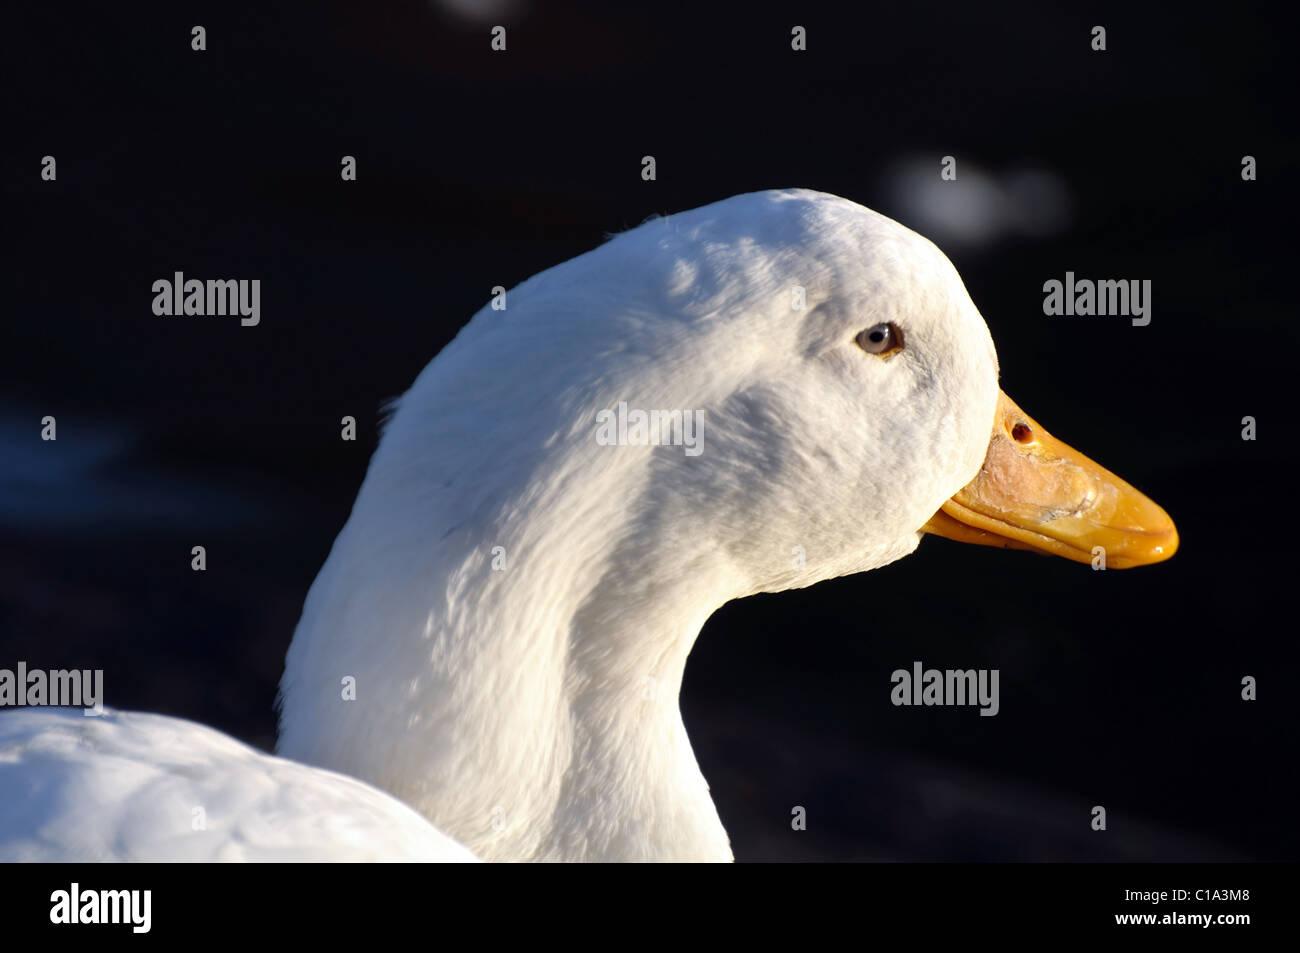 Head shot of an Aylesbury duck - Stock Image